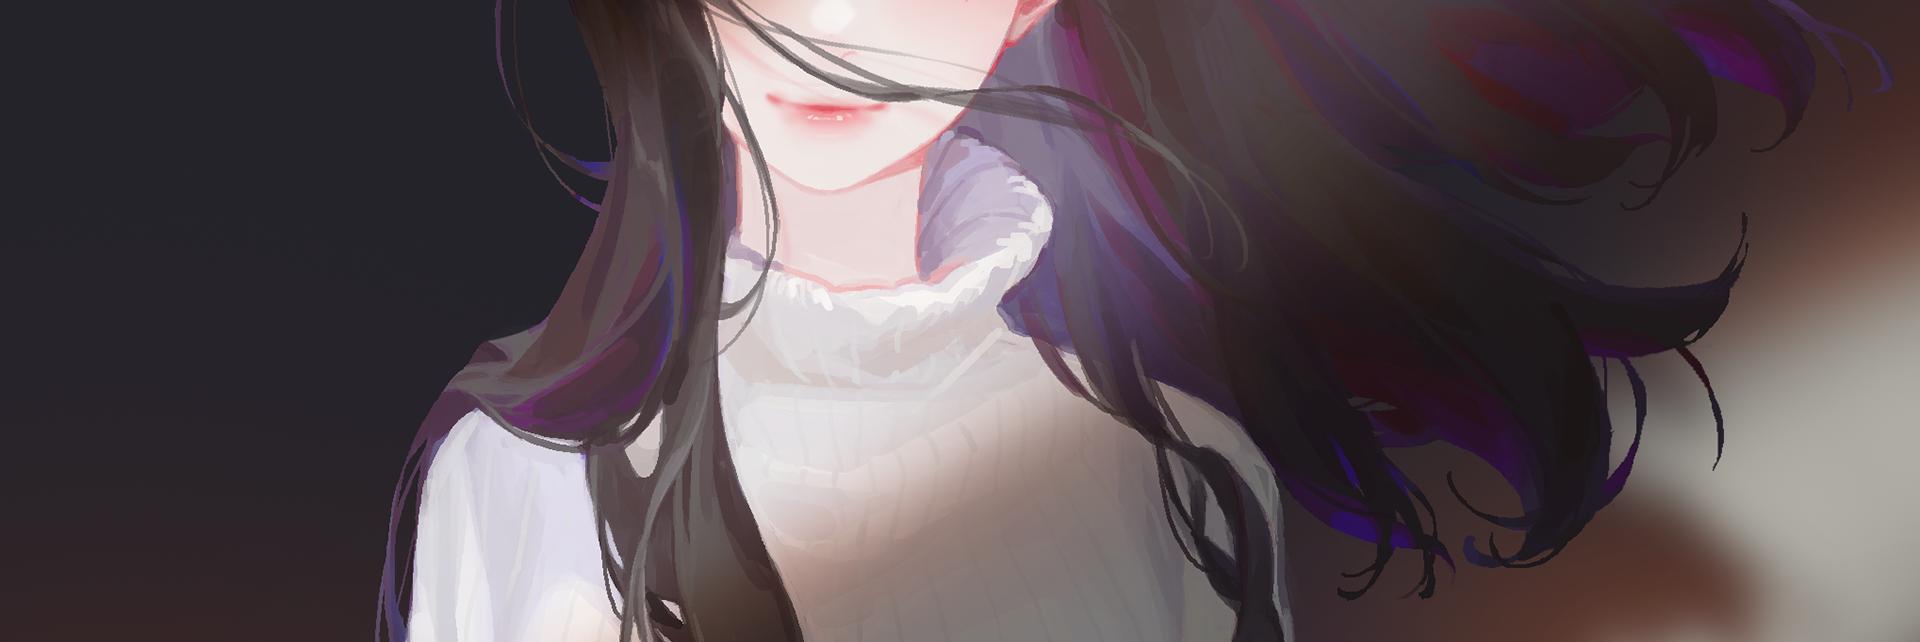 - Illust of ilion original girl ミステリアス